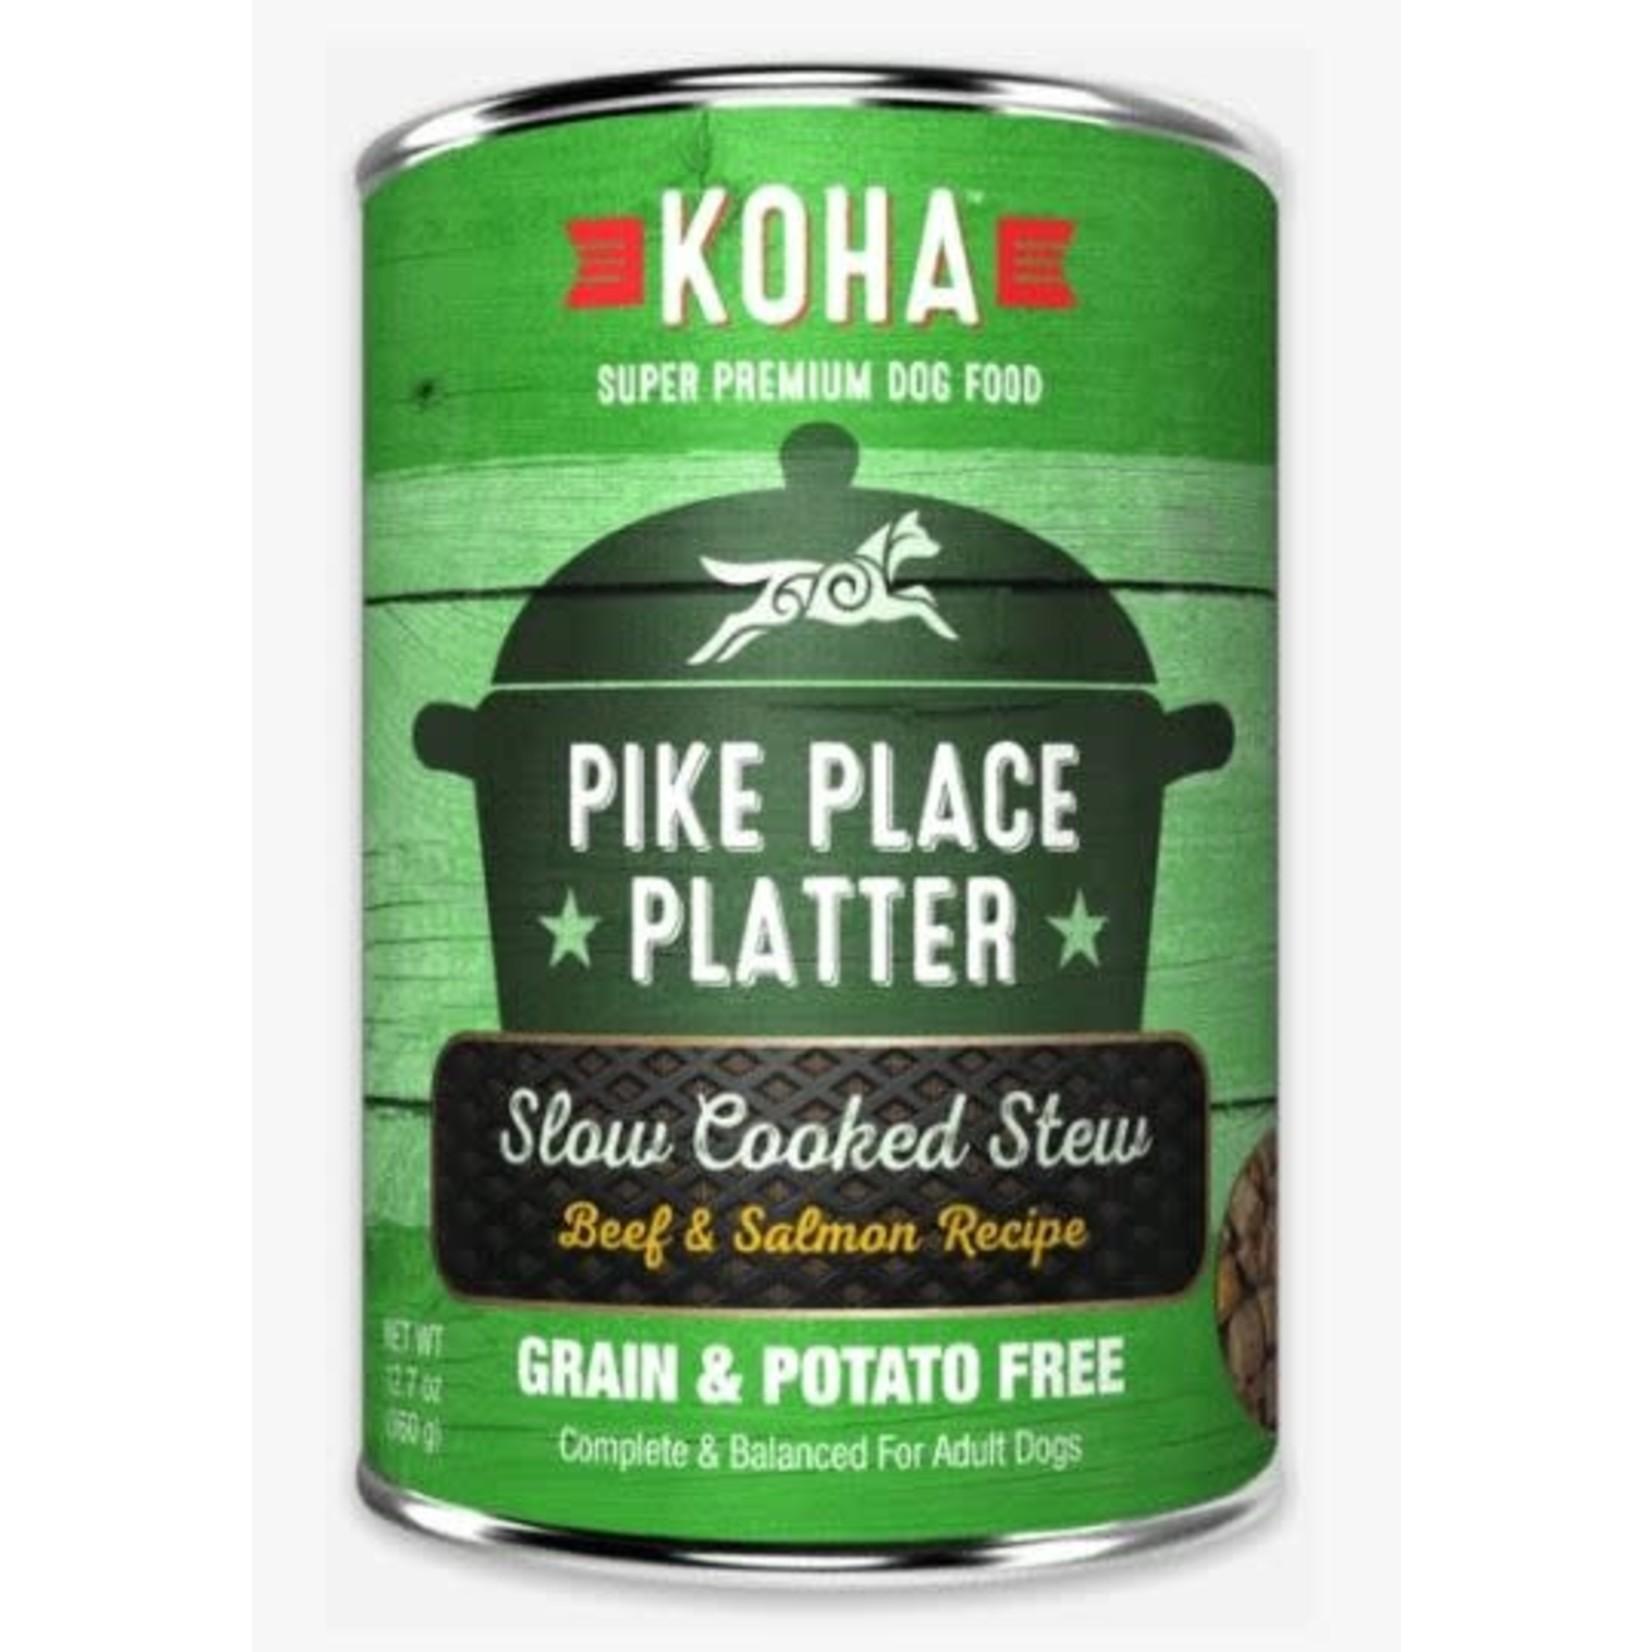 Koha KOHA Pike Place Platter Stew Beef & Salmon Canned Dog Food 12.7oz